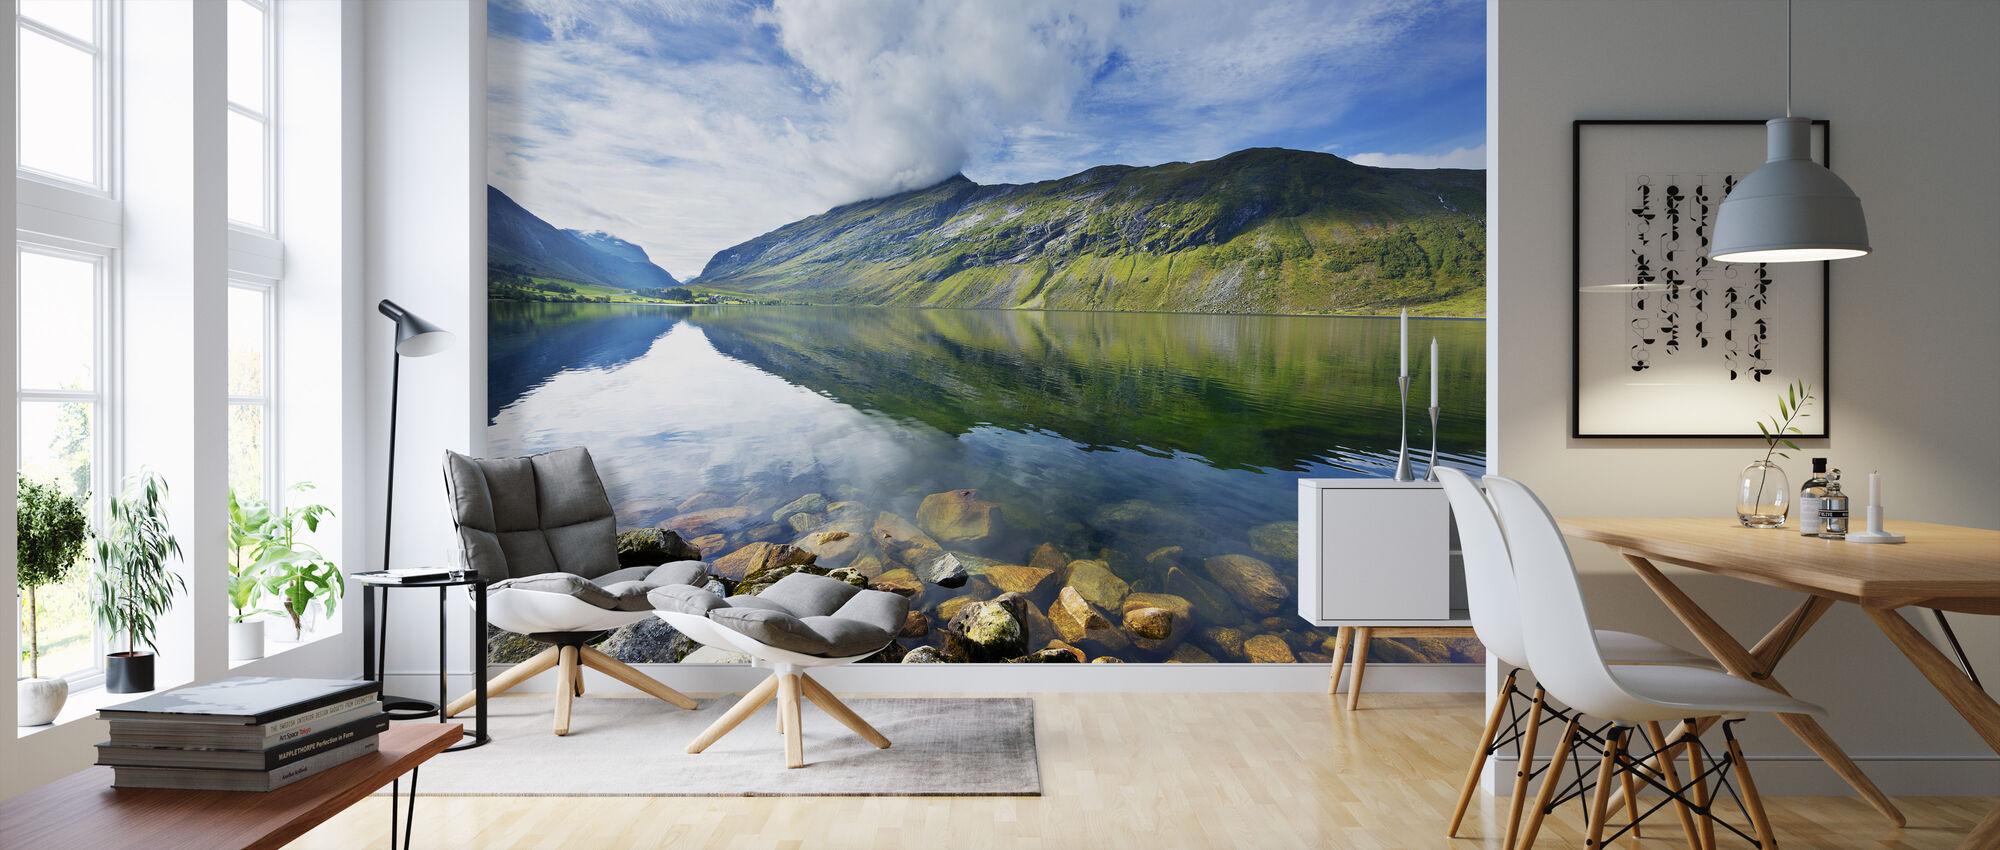 Eidsdal Lake i Geiranger, Norge II - Tapet - Stue